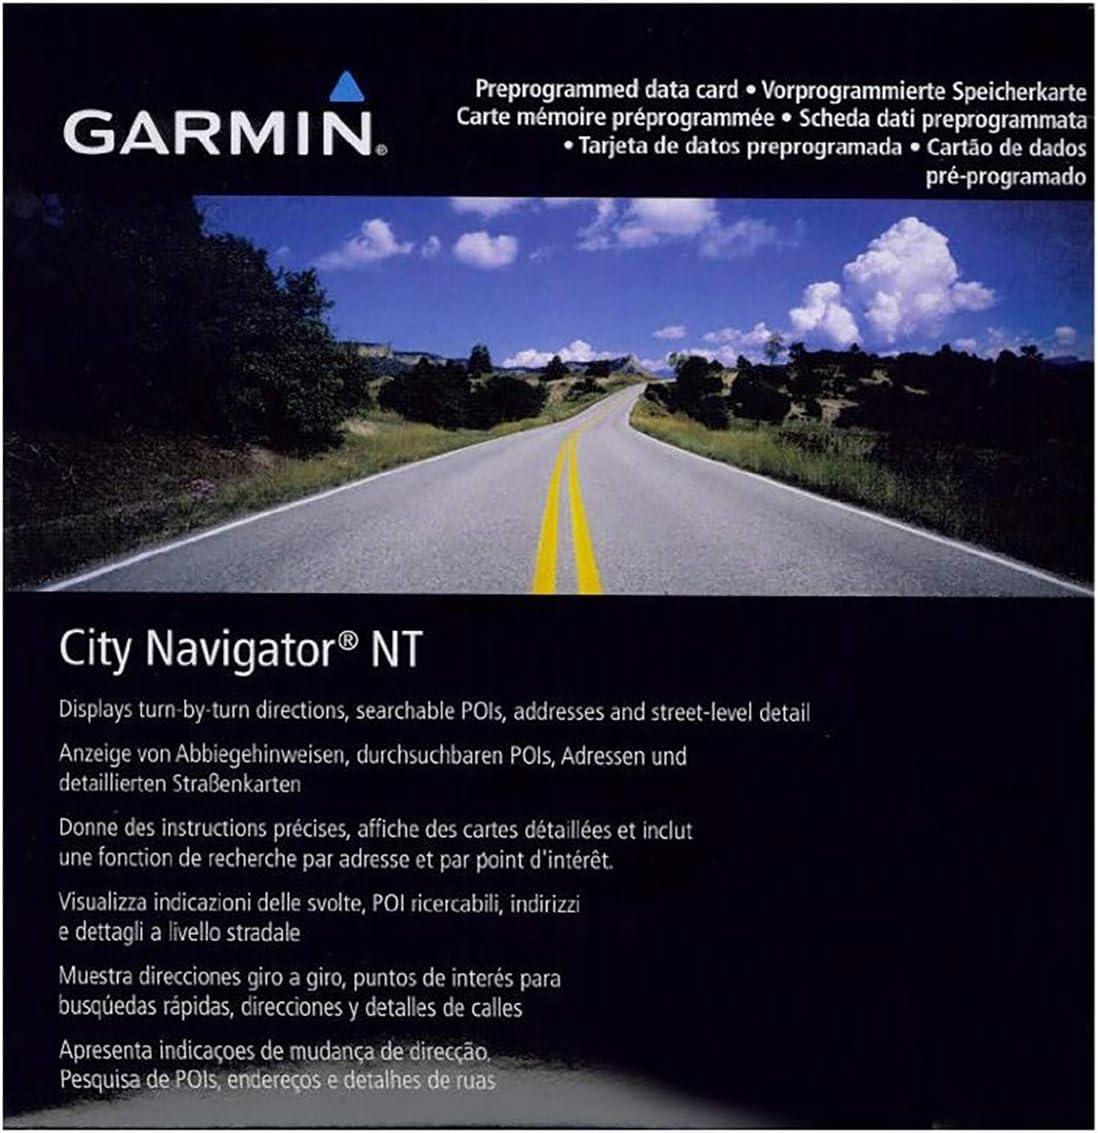 Garmin Map City Navigator Egypt NT SD microSD card